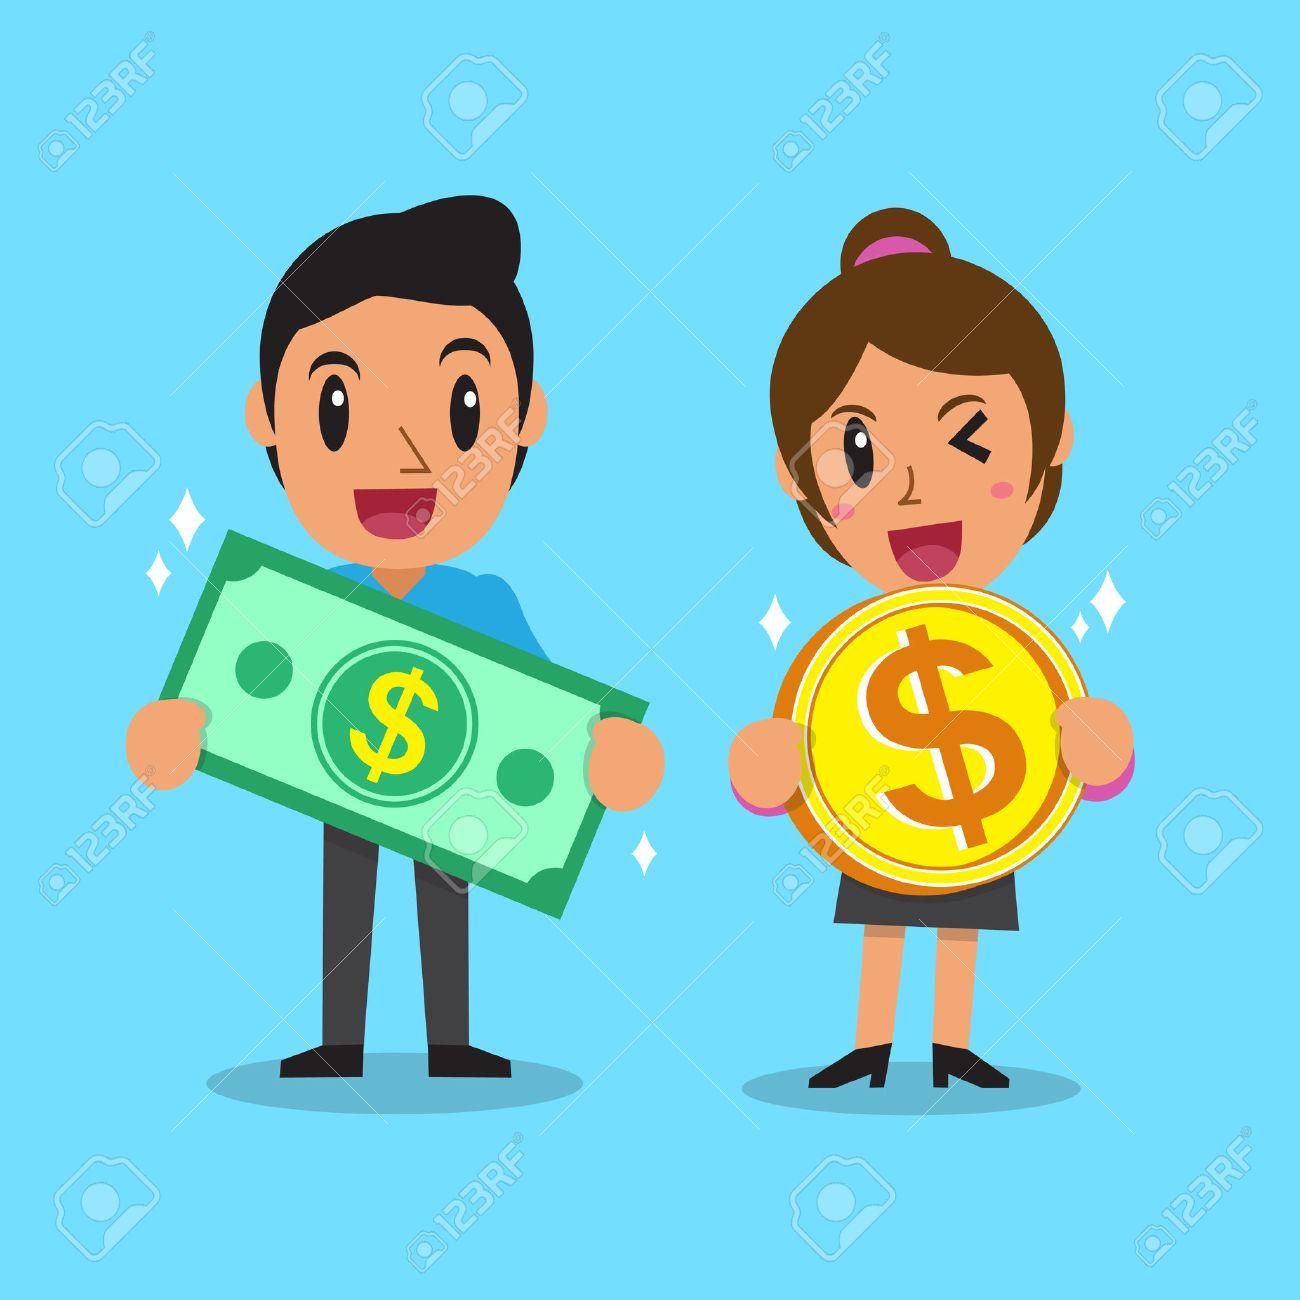 Cartoon business people holding money - 48757769